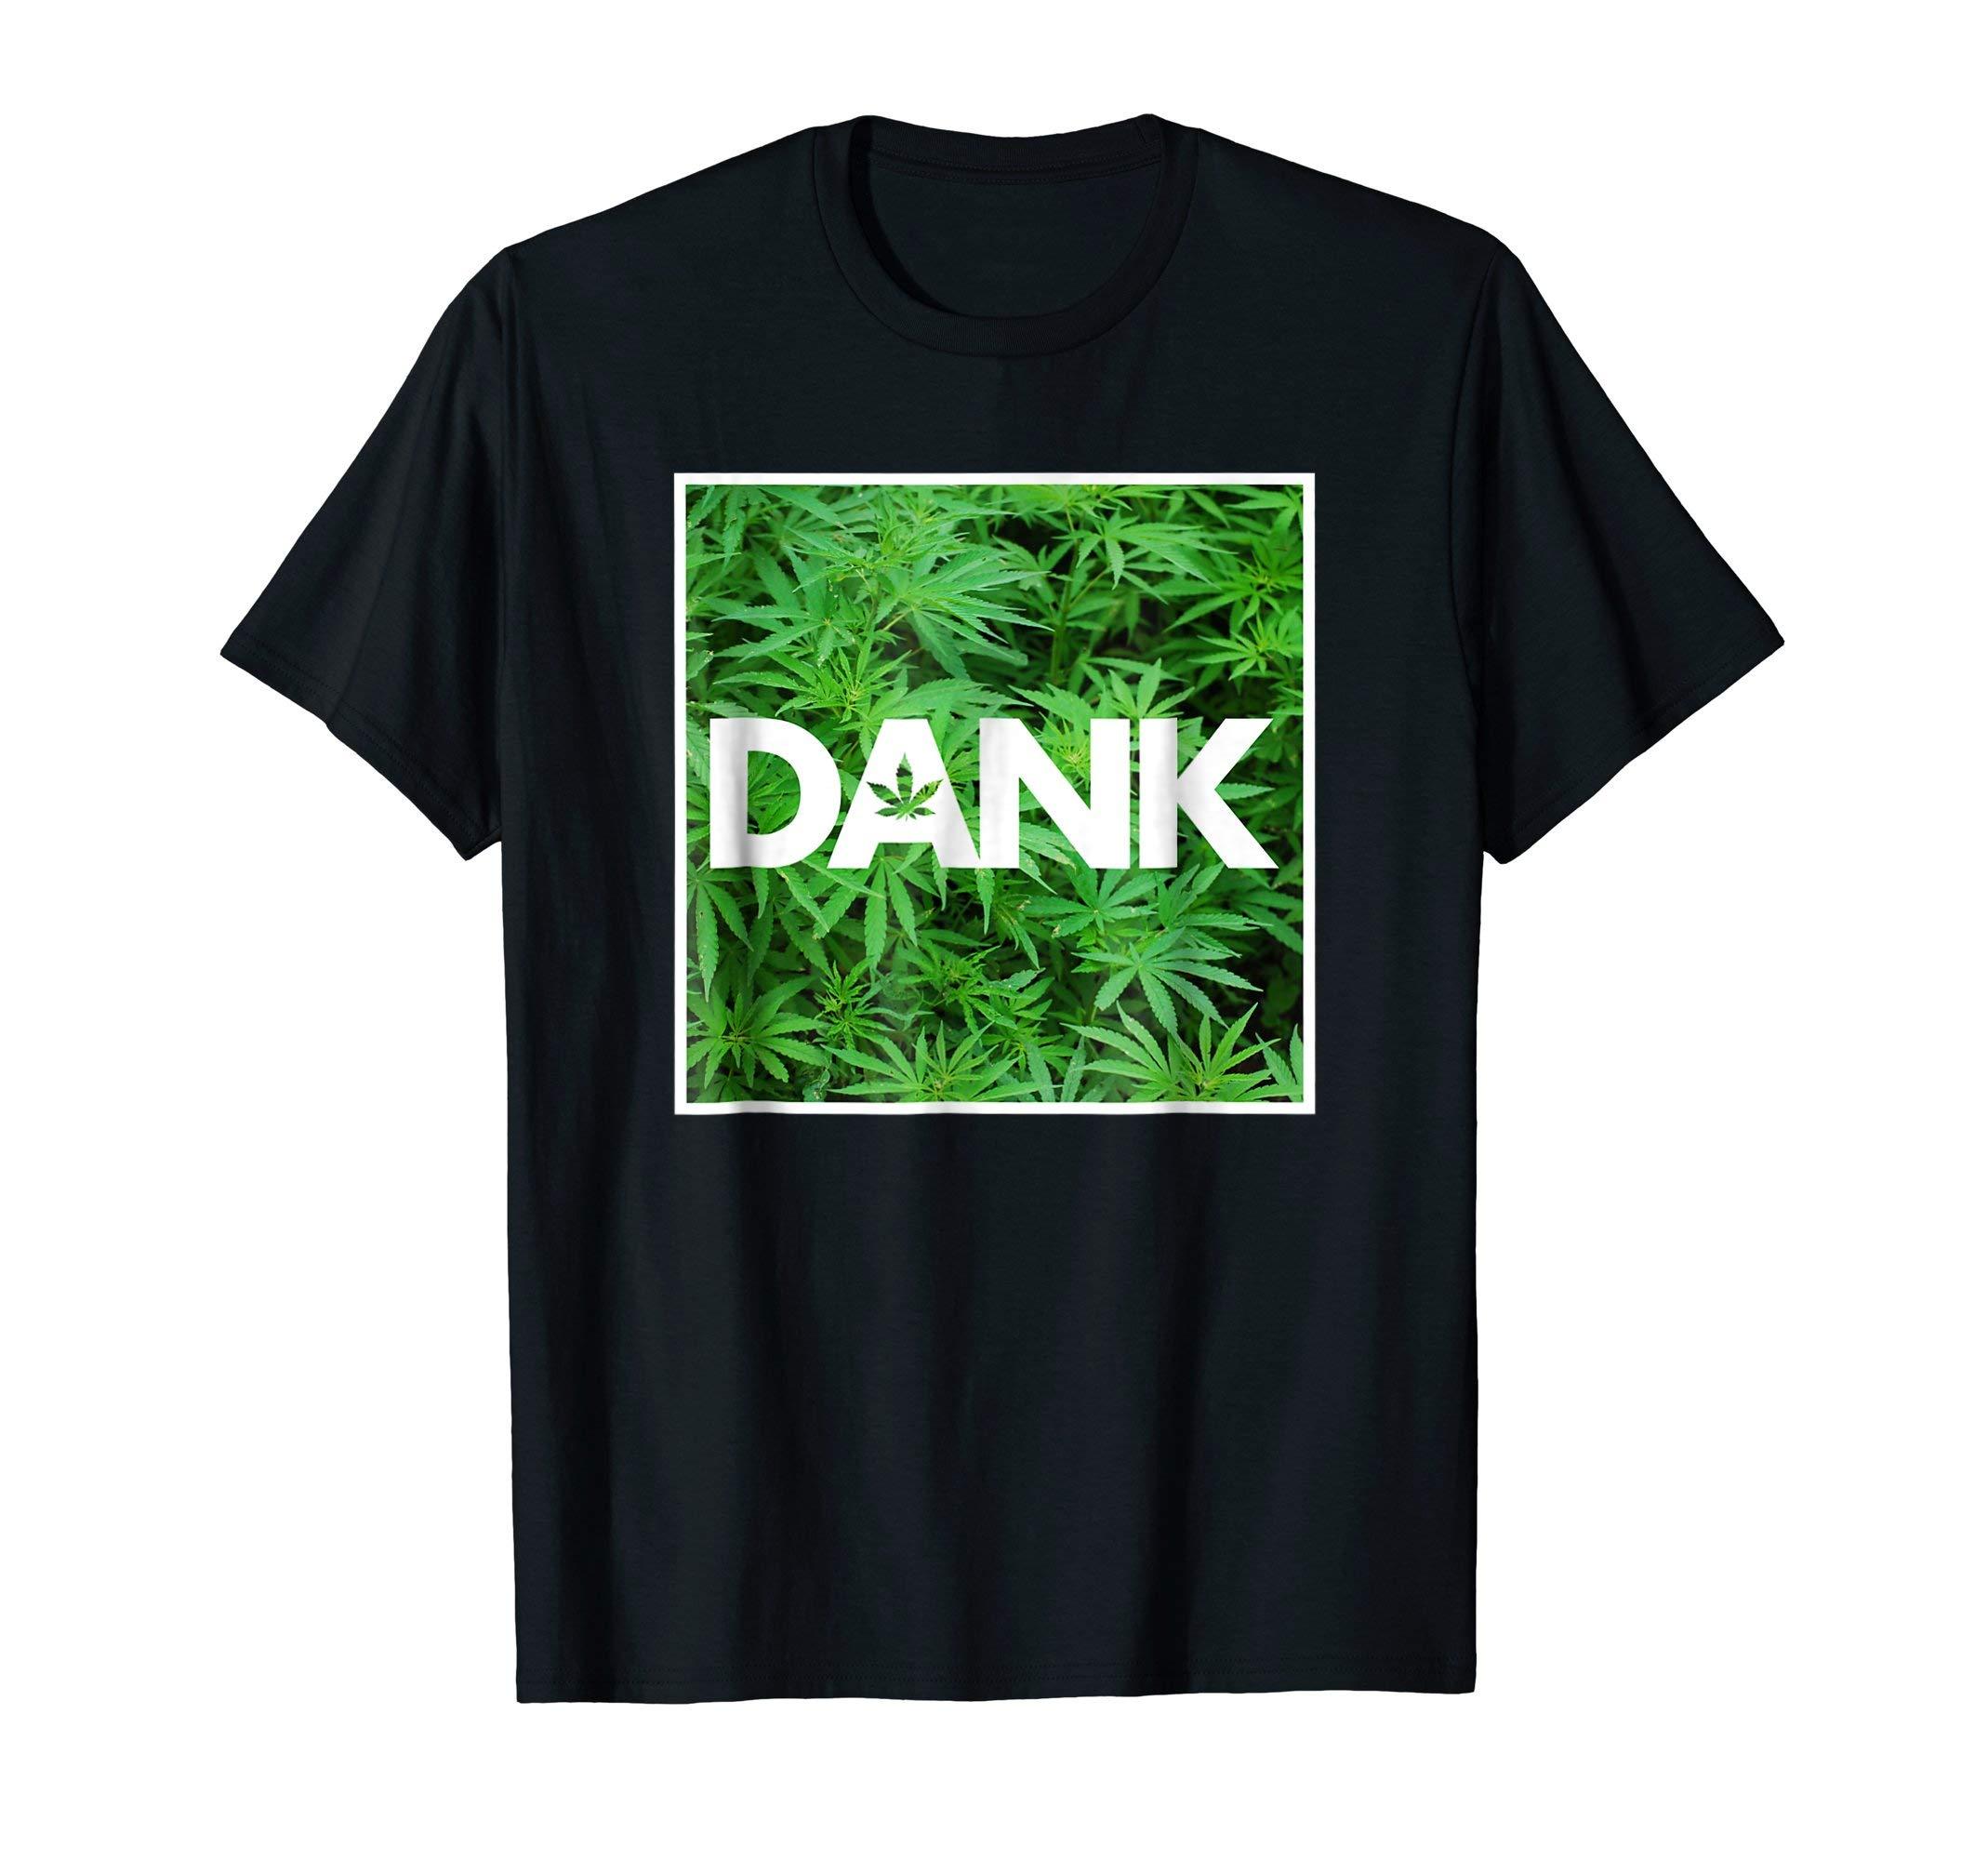 Dank Marijuana Cannabis Weed Pot Leaves T-Shirt